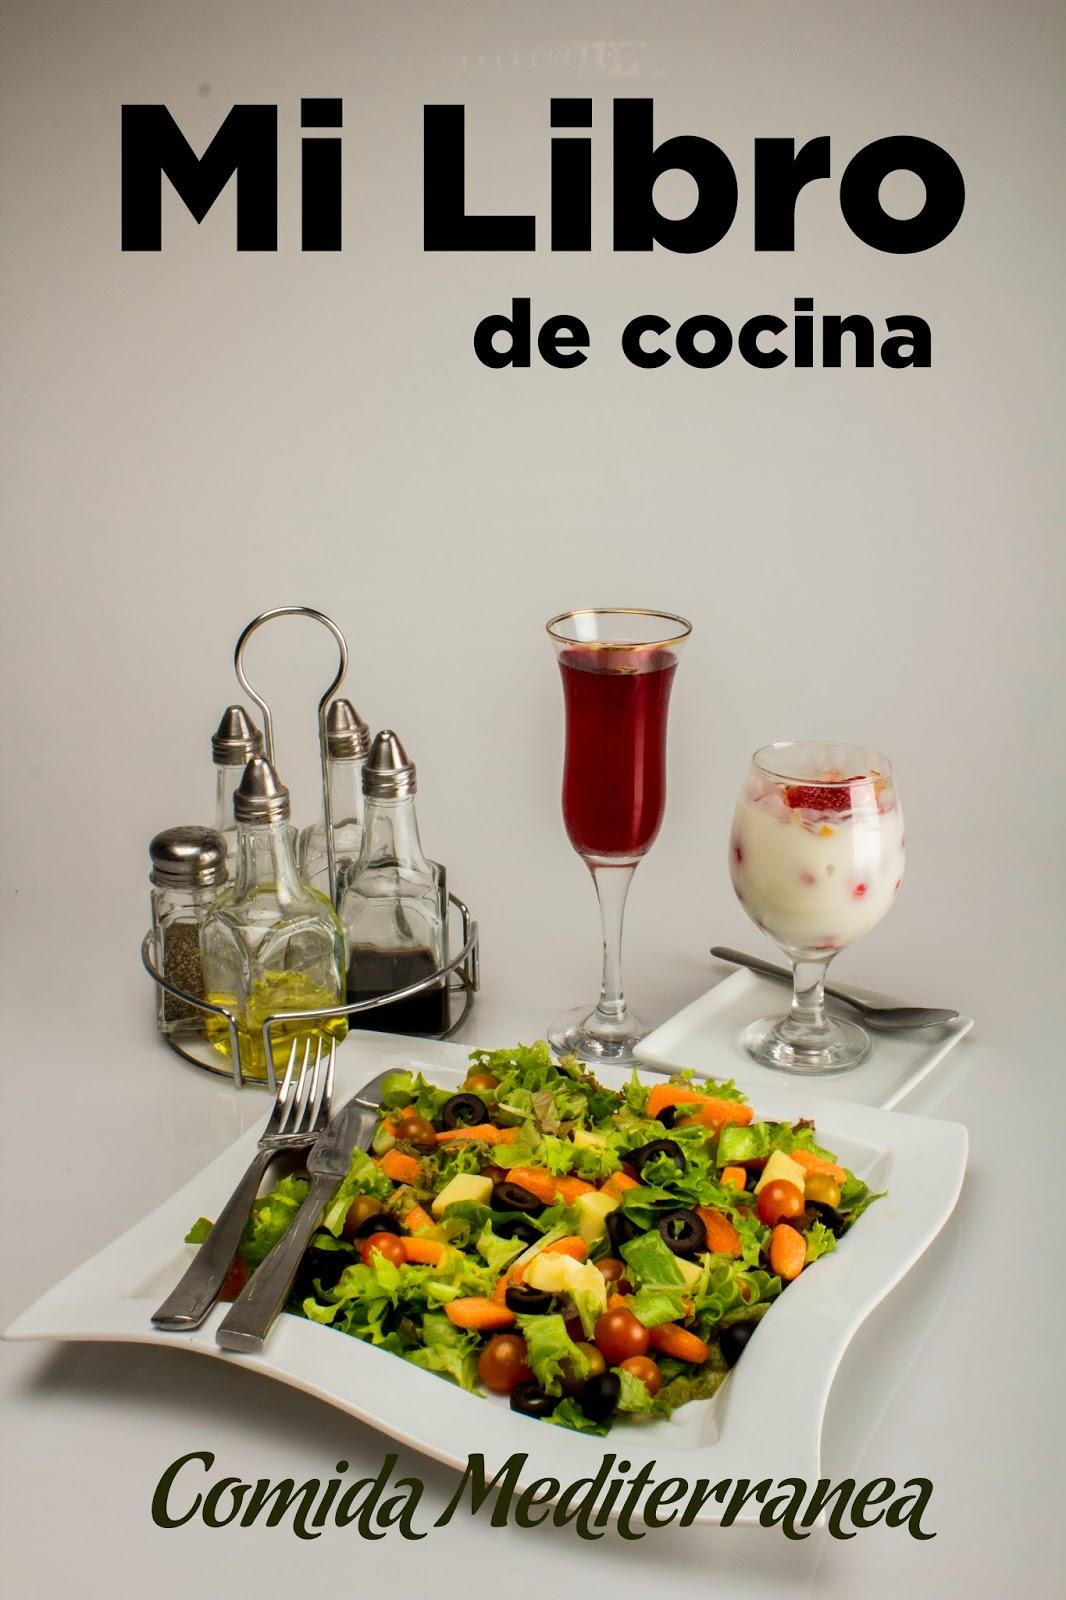 Maupixeles luis gustavo sierra - Libros de cocina ...